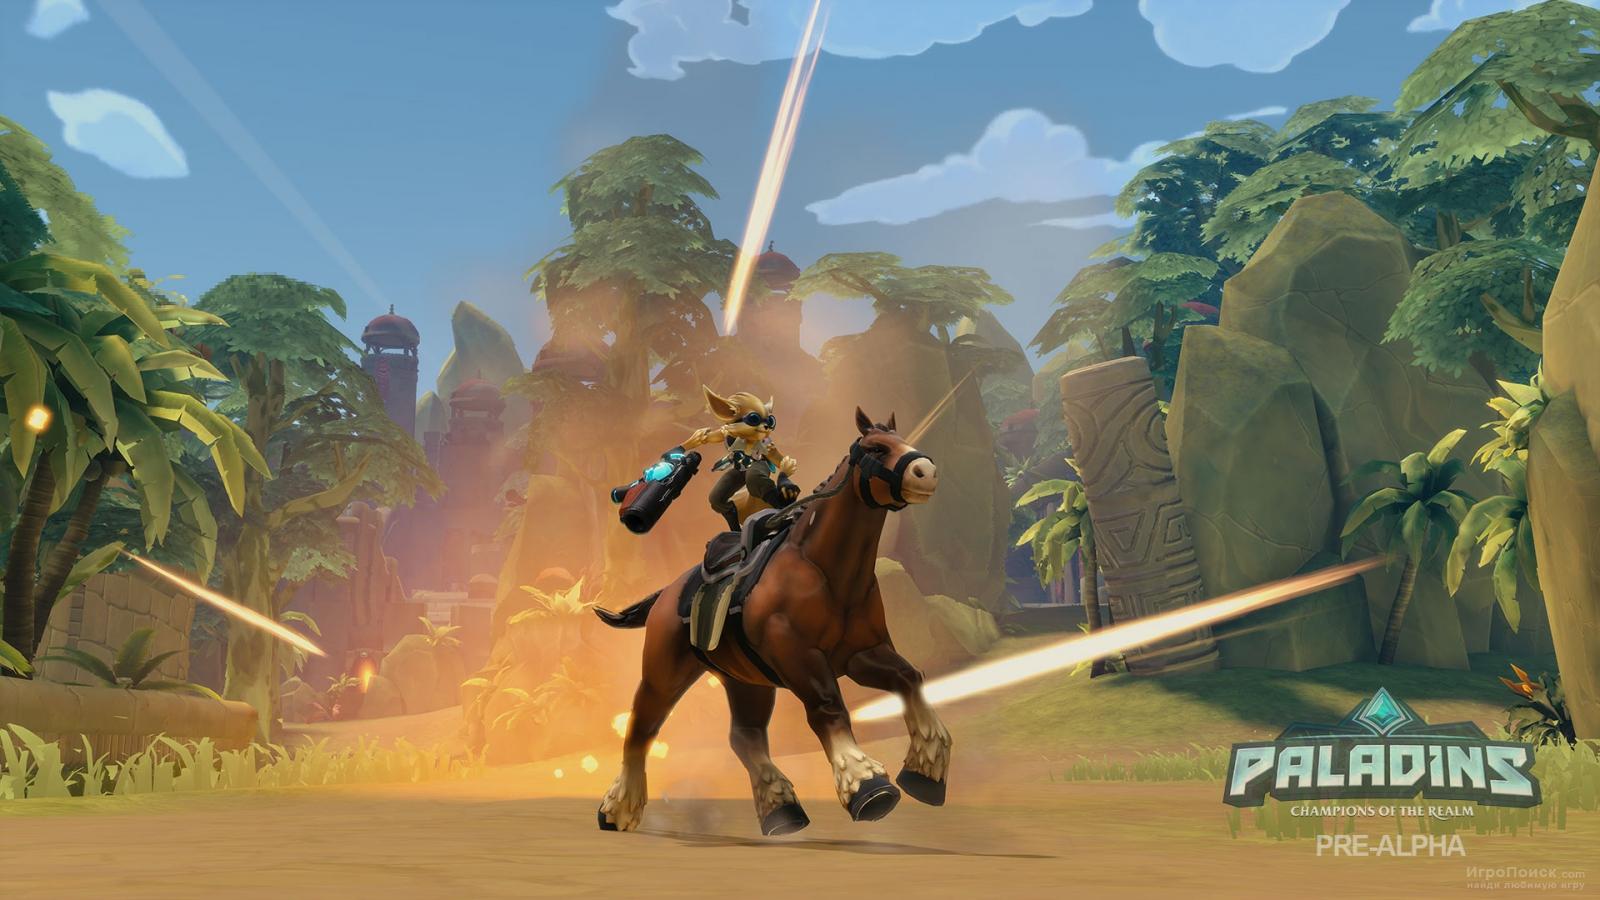 Скриншот к игре Paladins: Champions of the Realm